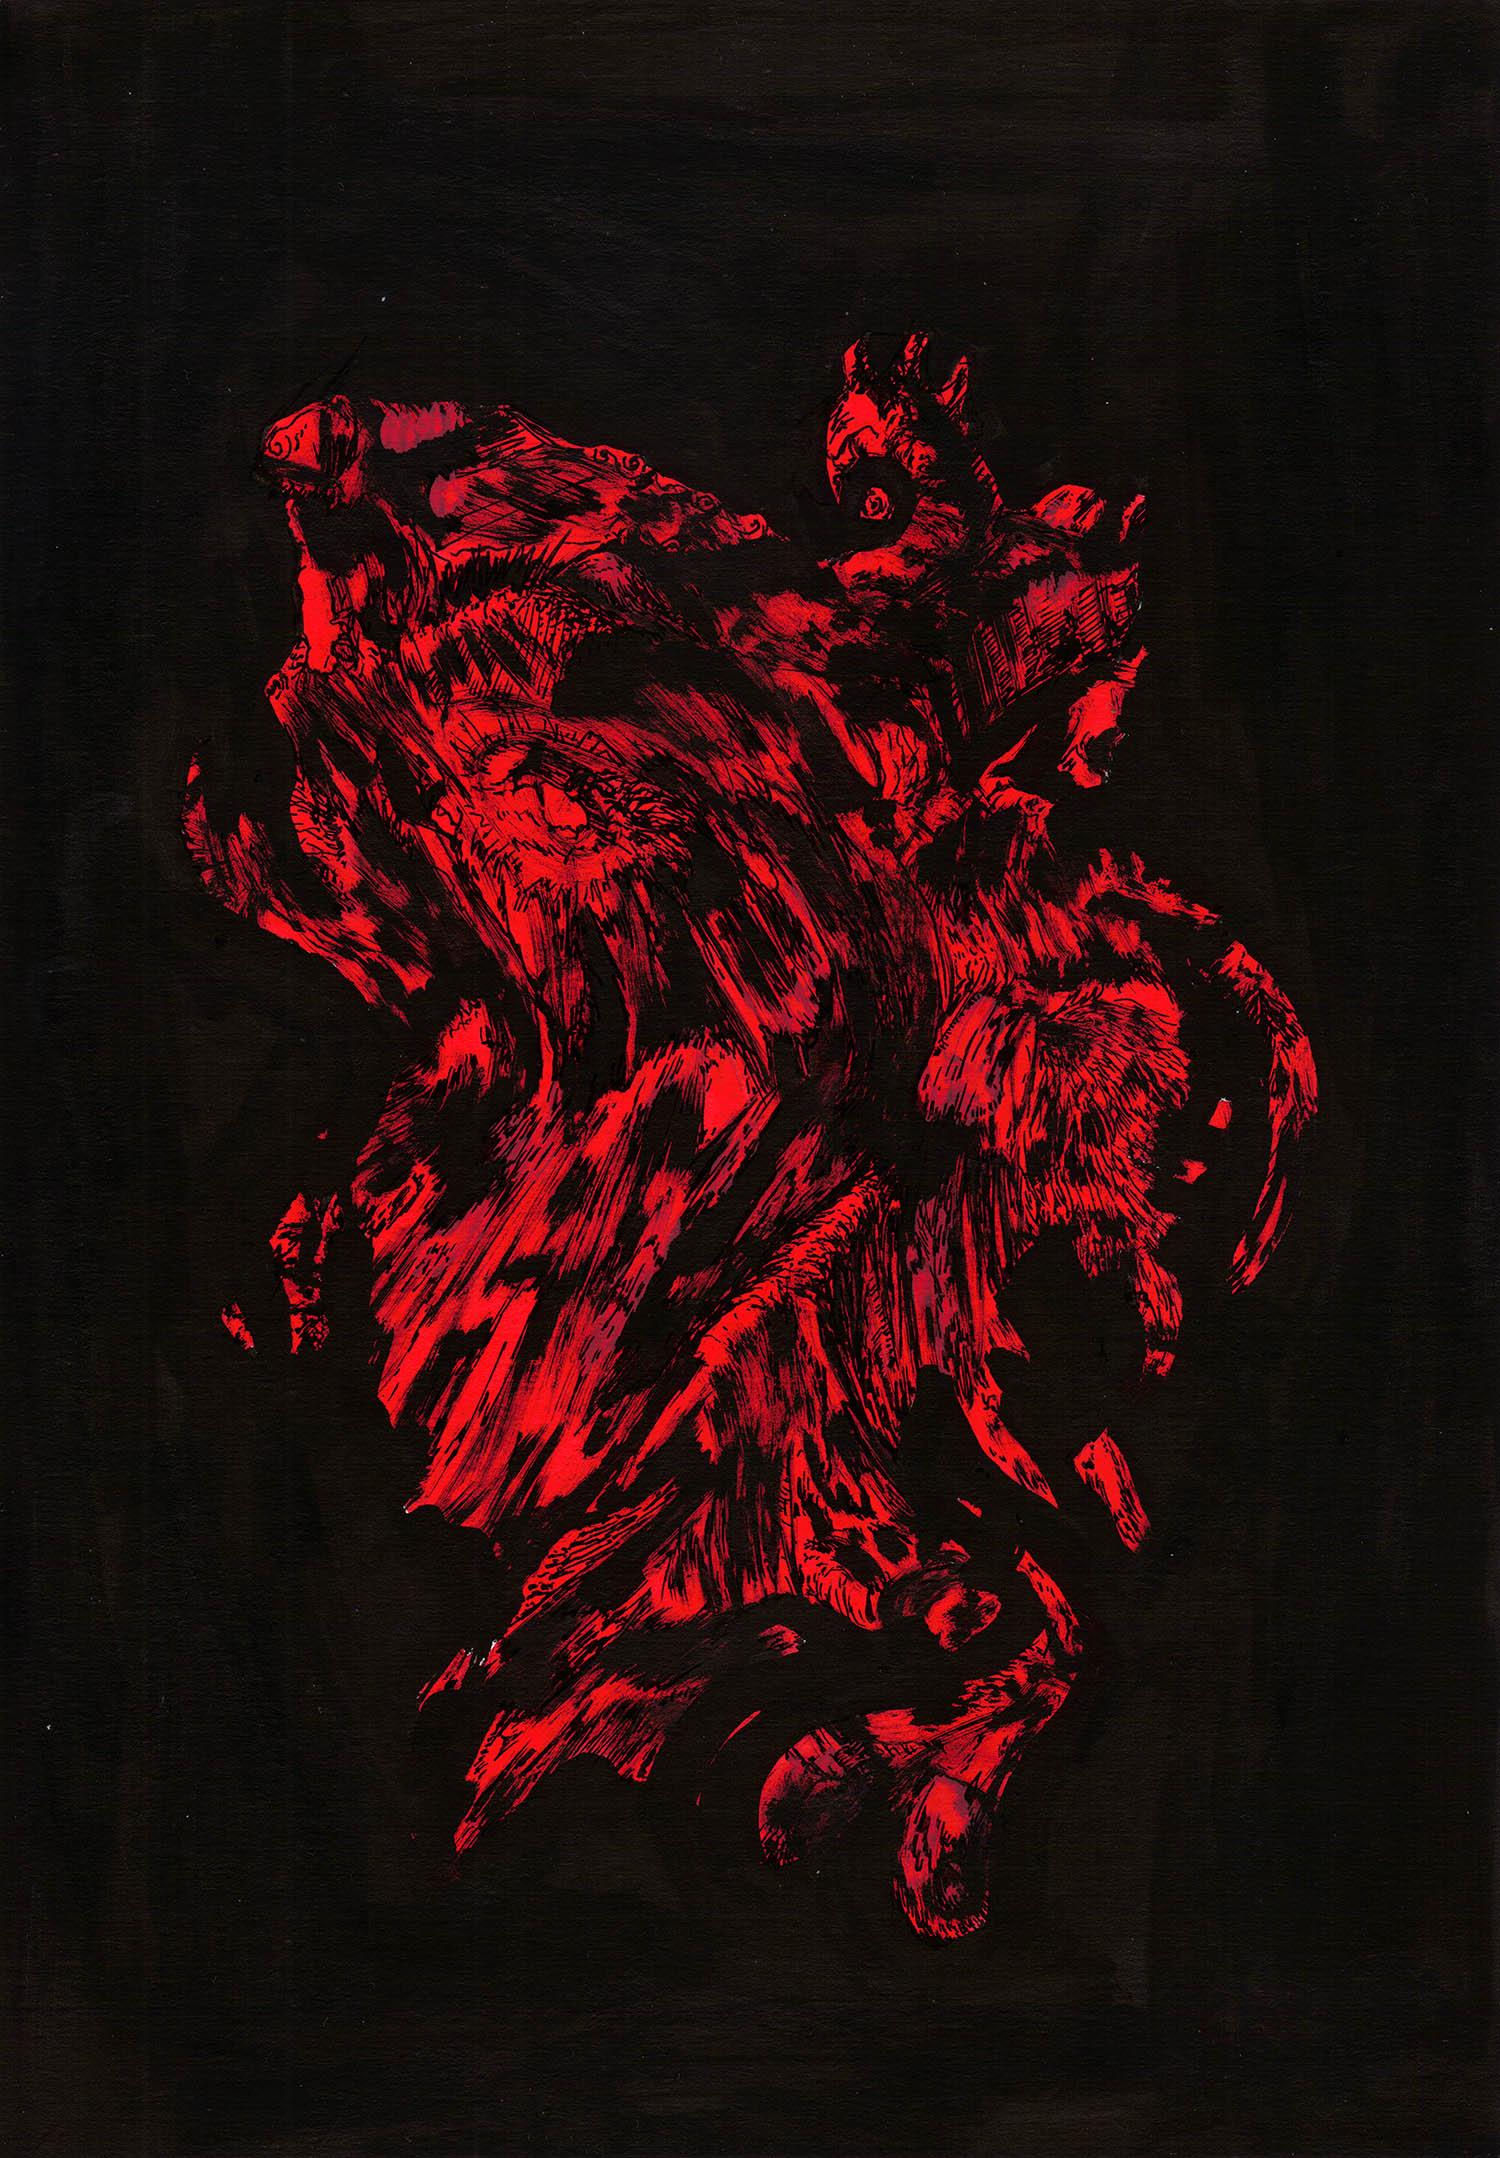 'Monstrous Red', An abstract dark black & red raw artwork by Greek multidisciplinary artist Kostas Gogas.